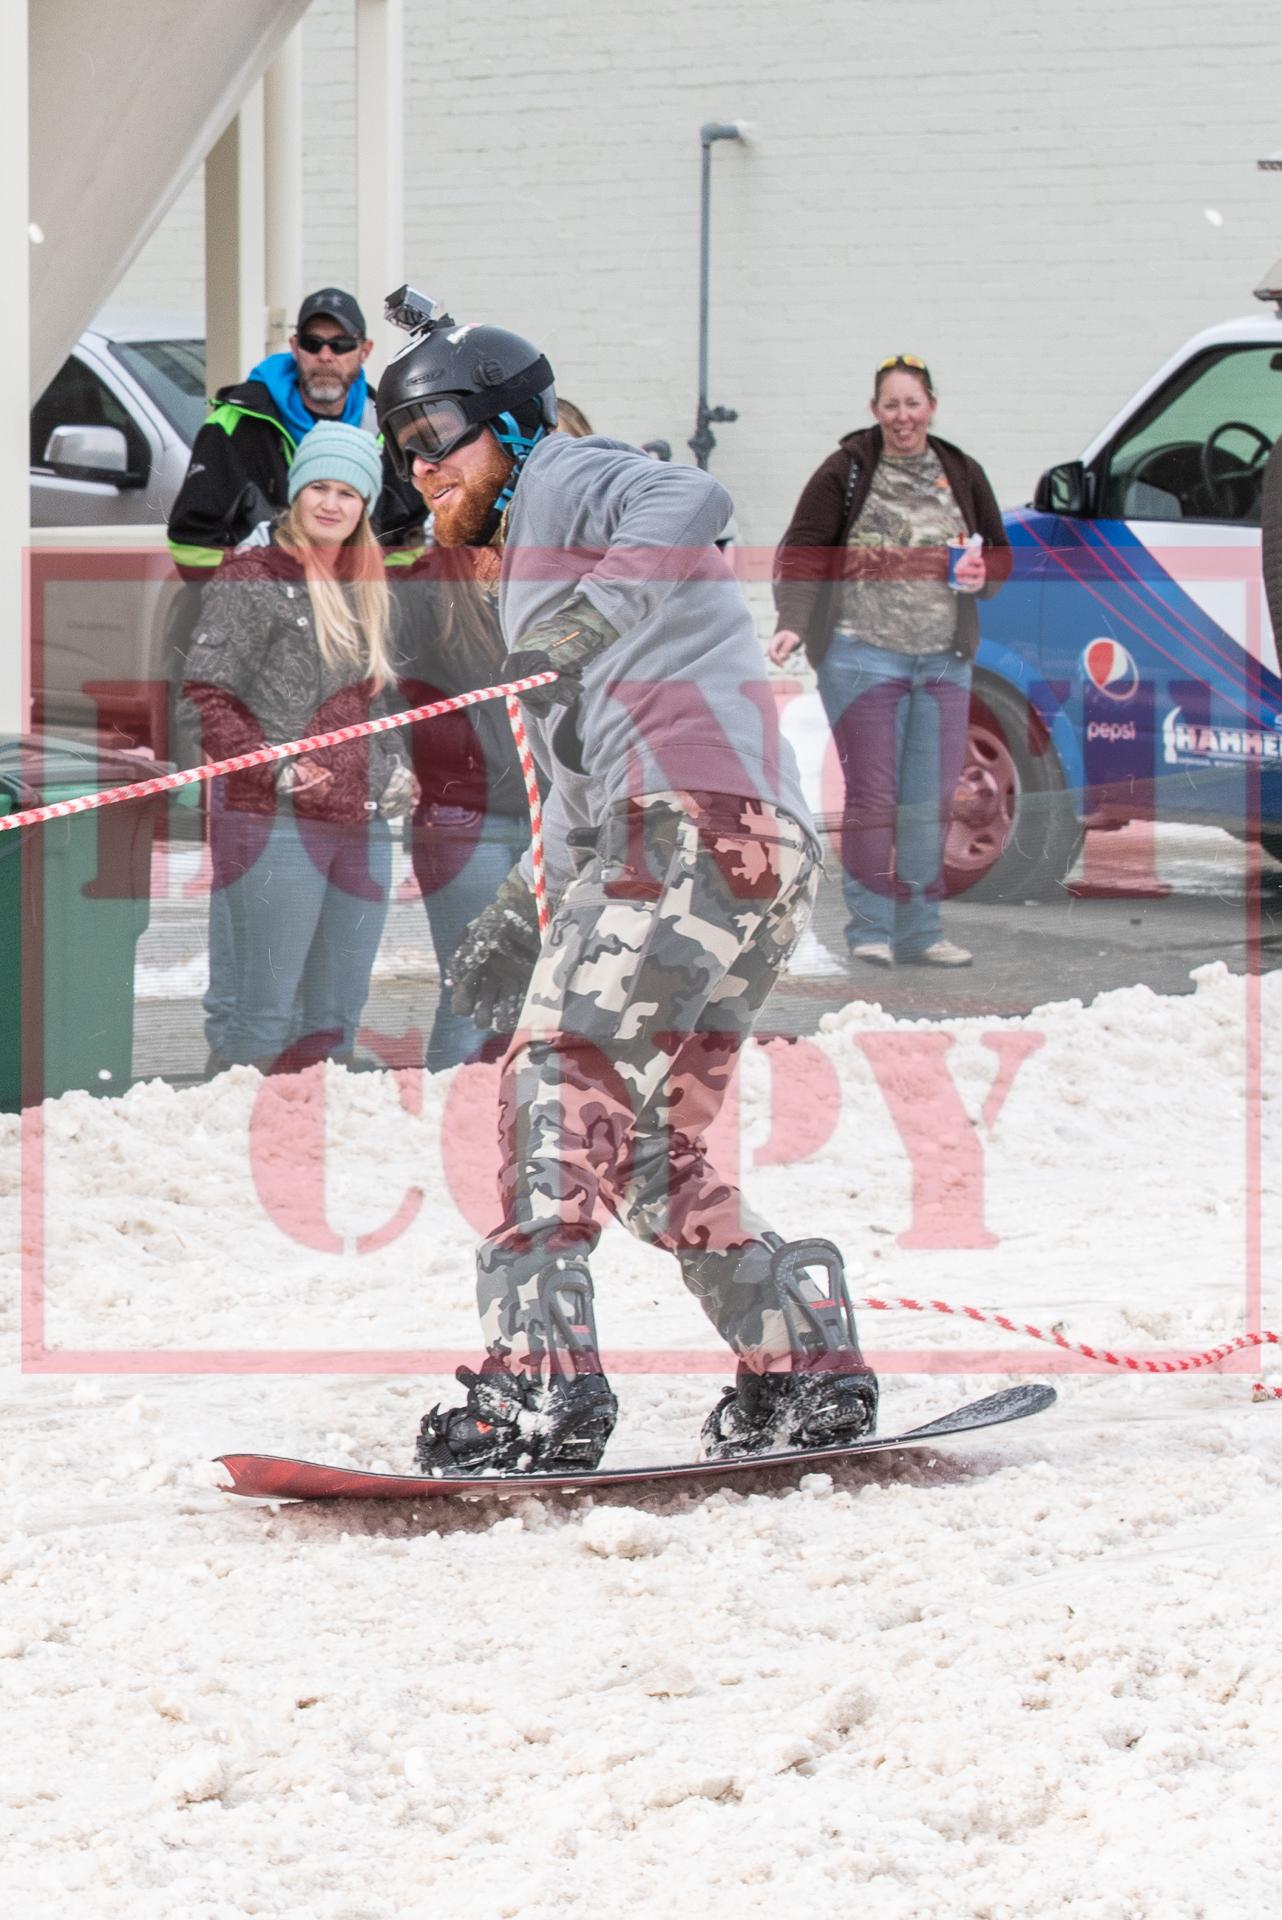 - Cody McKenzie - Snowboard 4